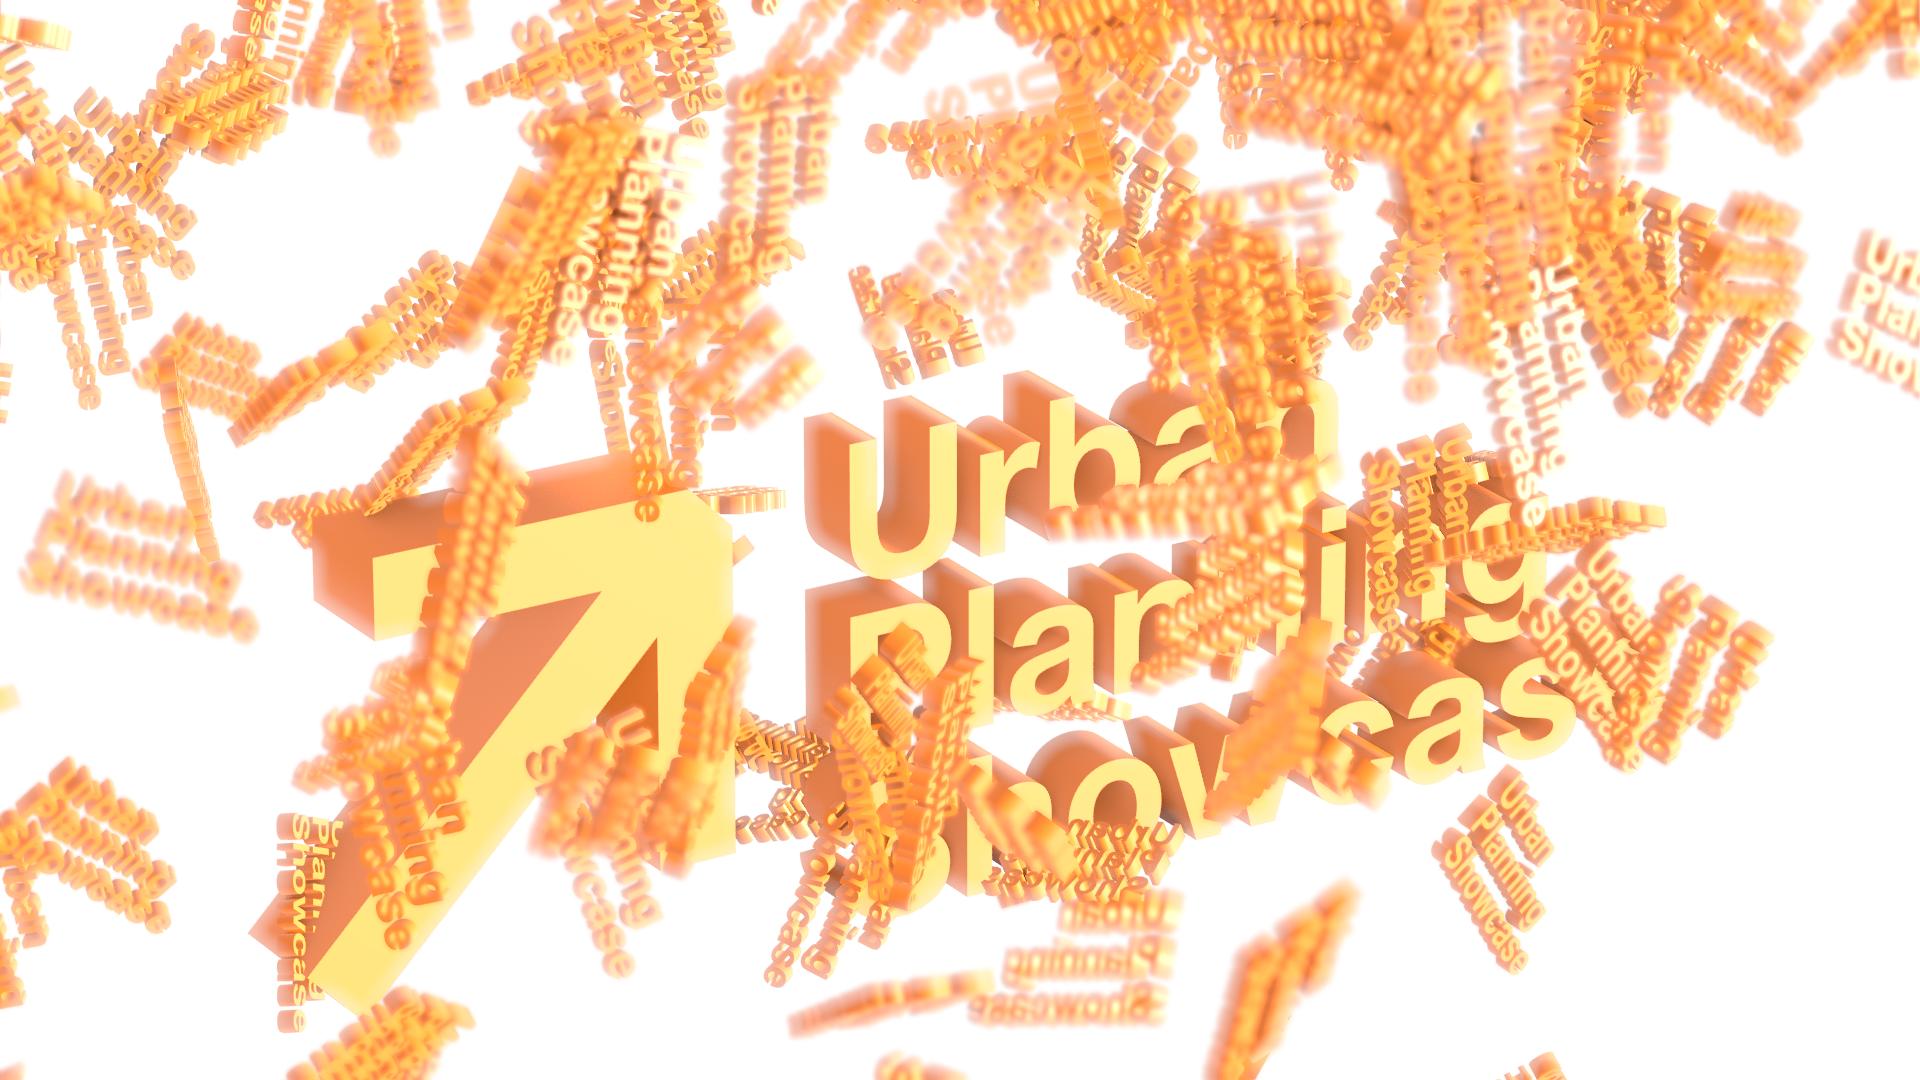 Wayfinding Graphics for Urban Planning Showcase